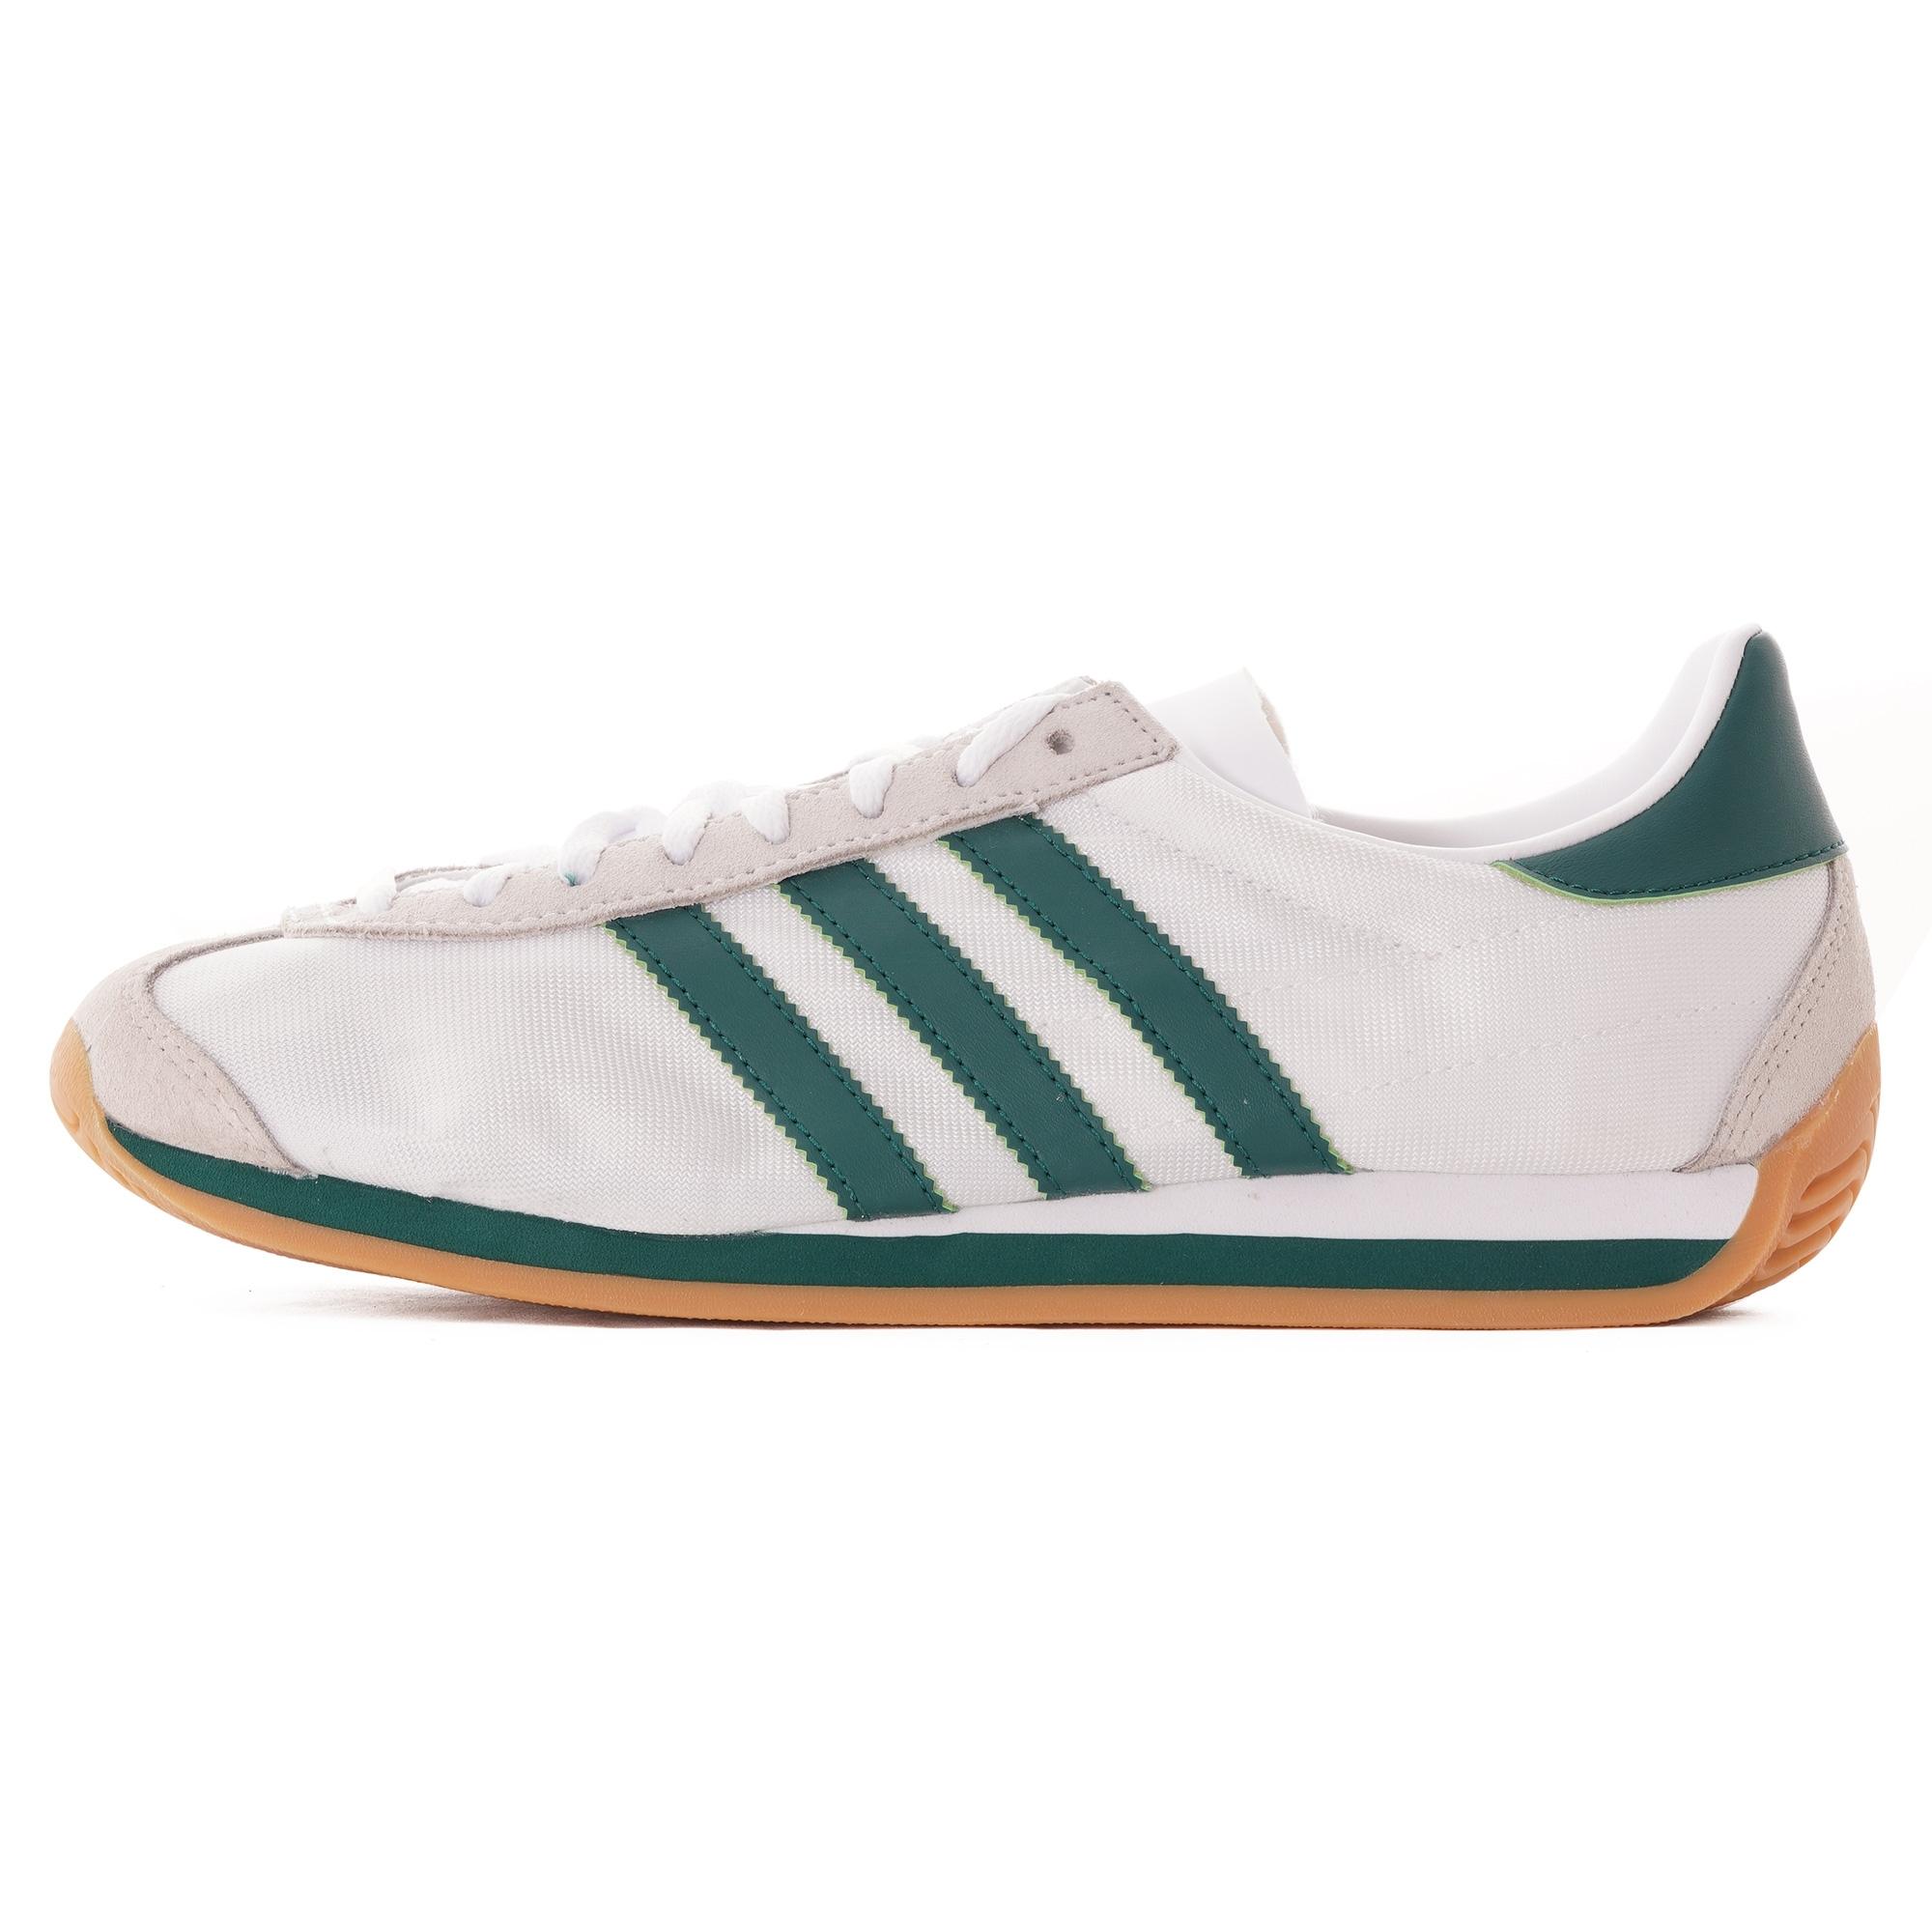 Country OG Shoes WhiteGreen